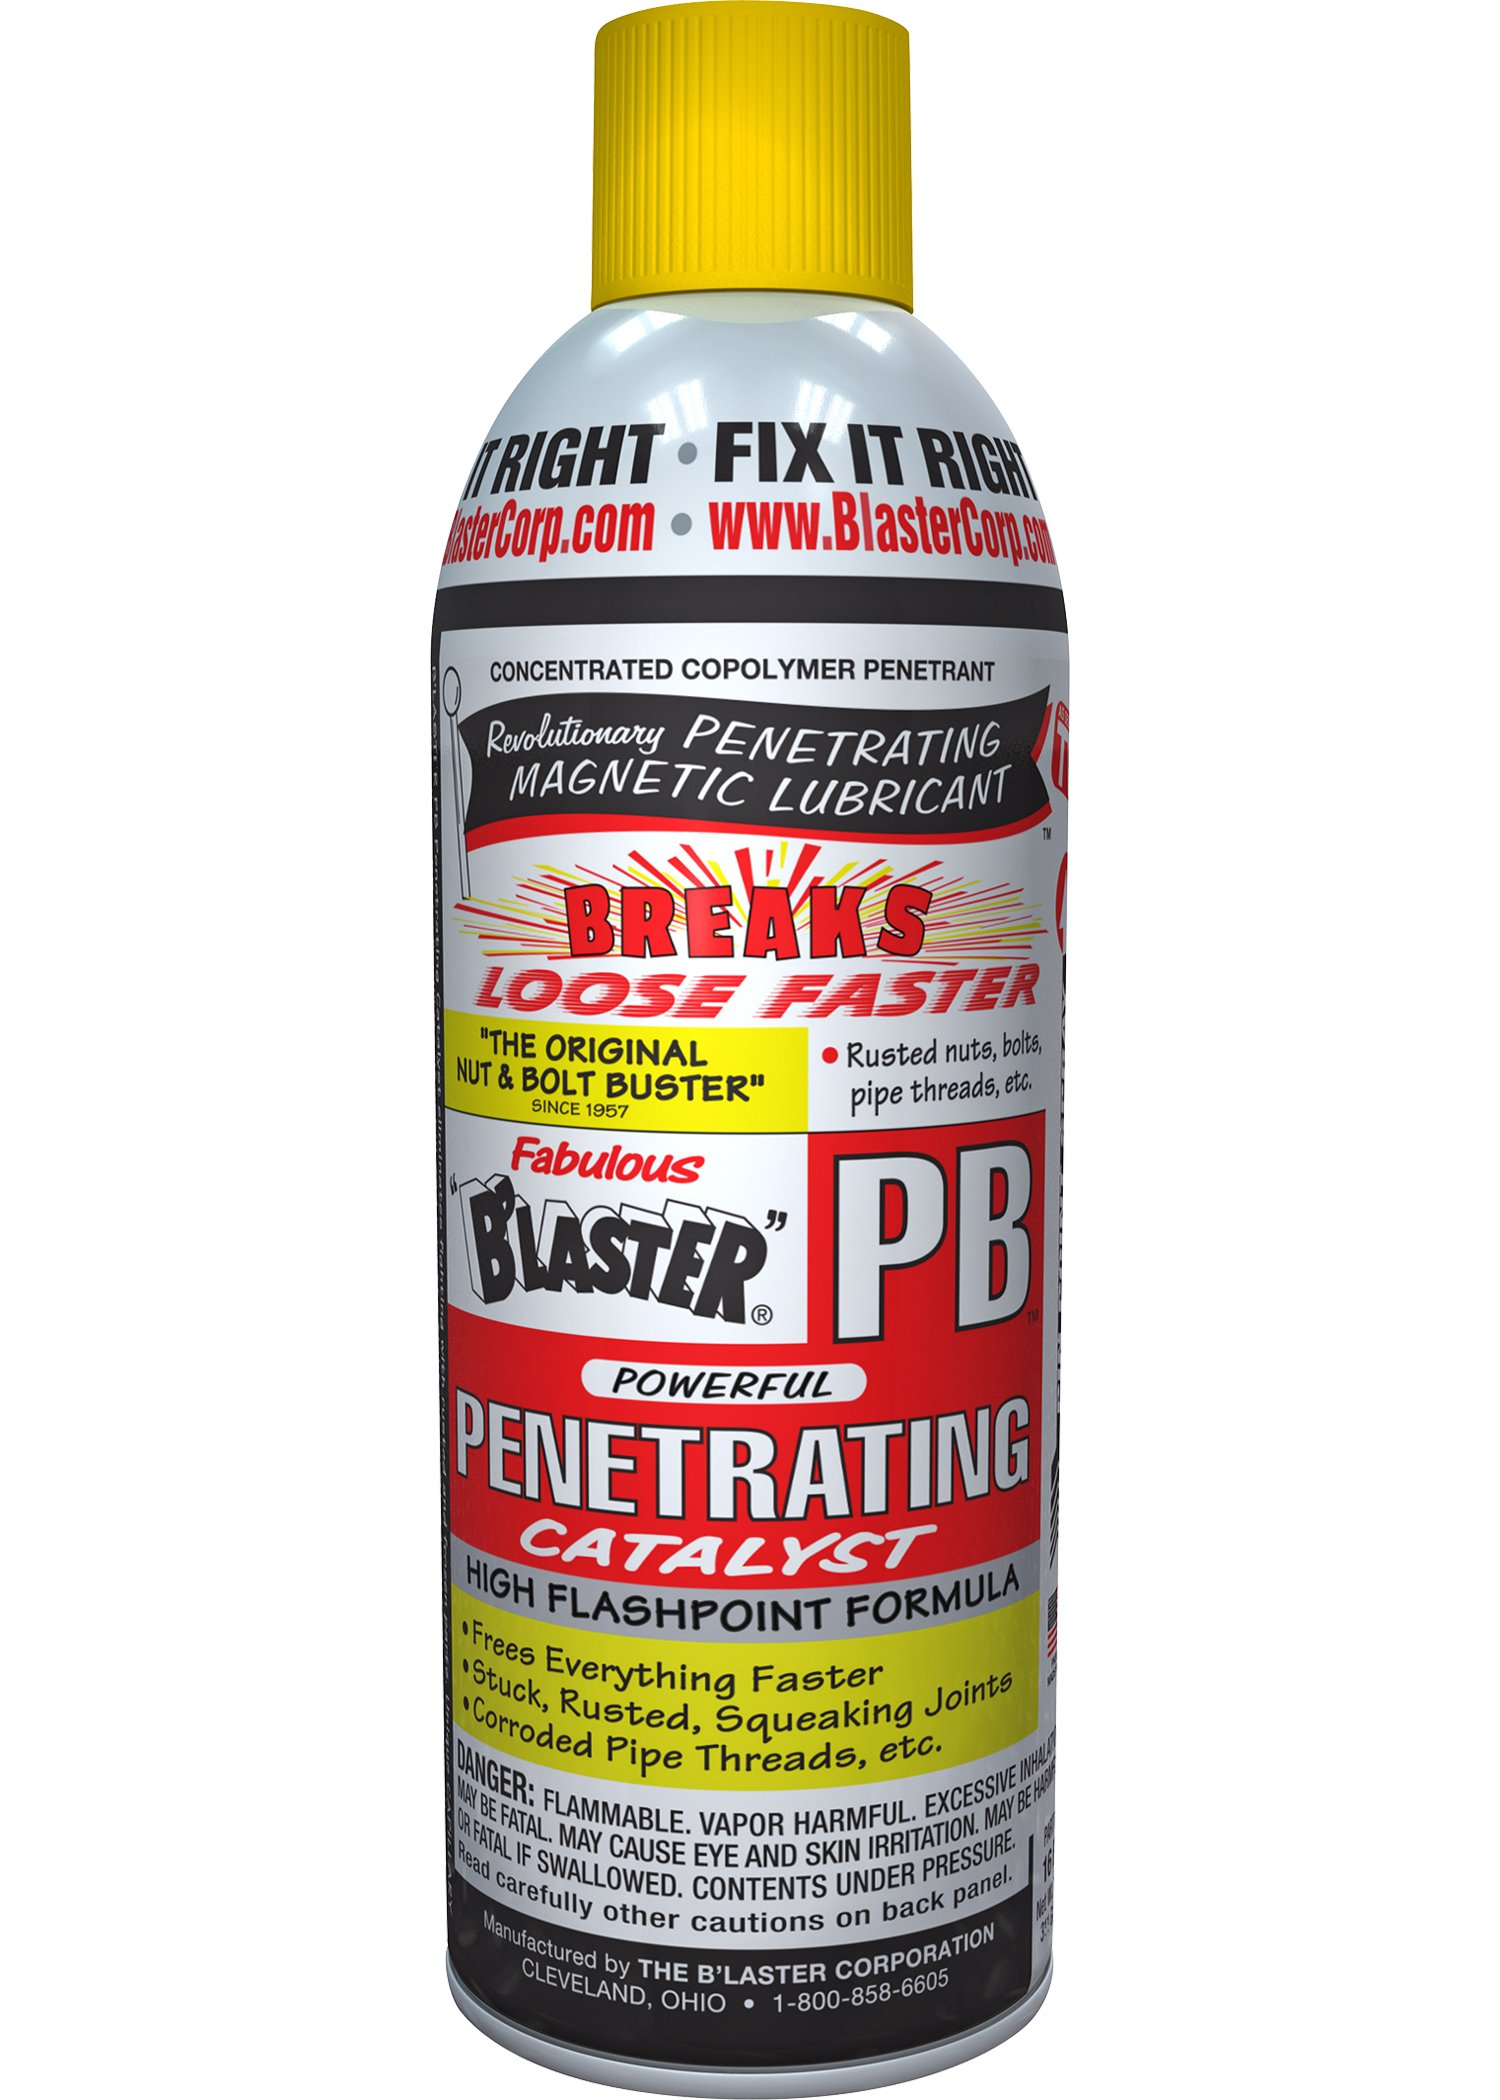 B'laster - 8-PB-12PK - Penetrating Catalyst - 7-Ounces - Case of 12